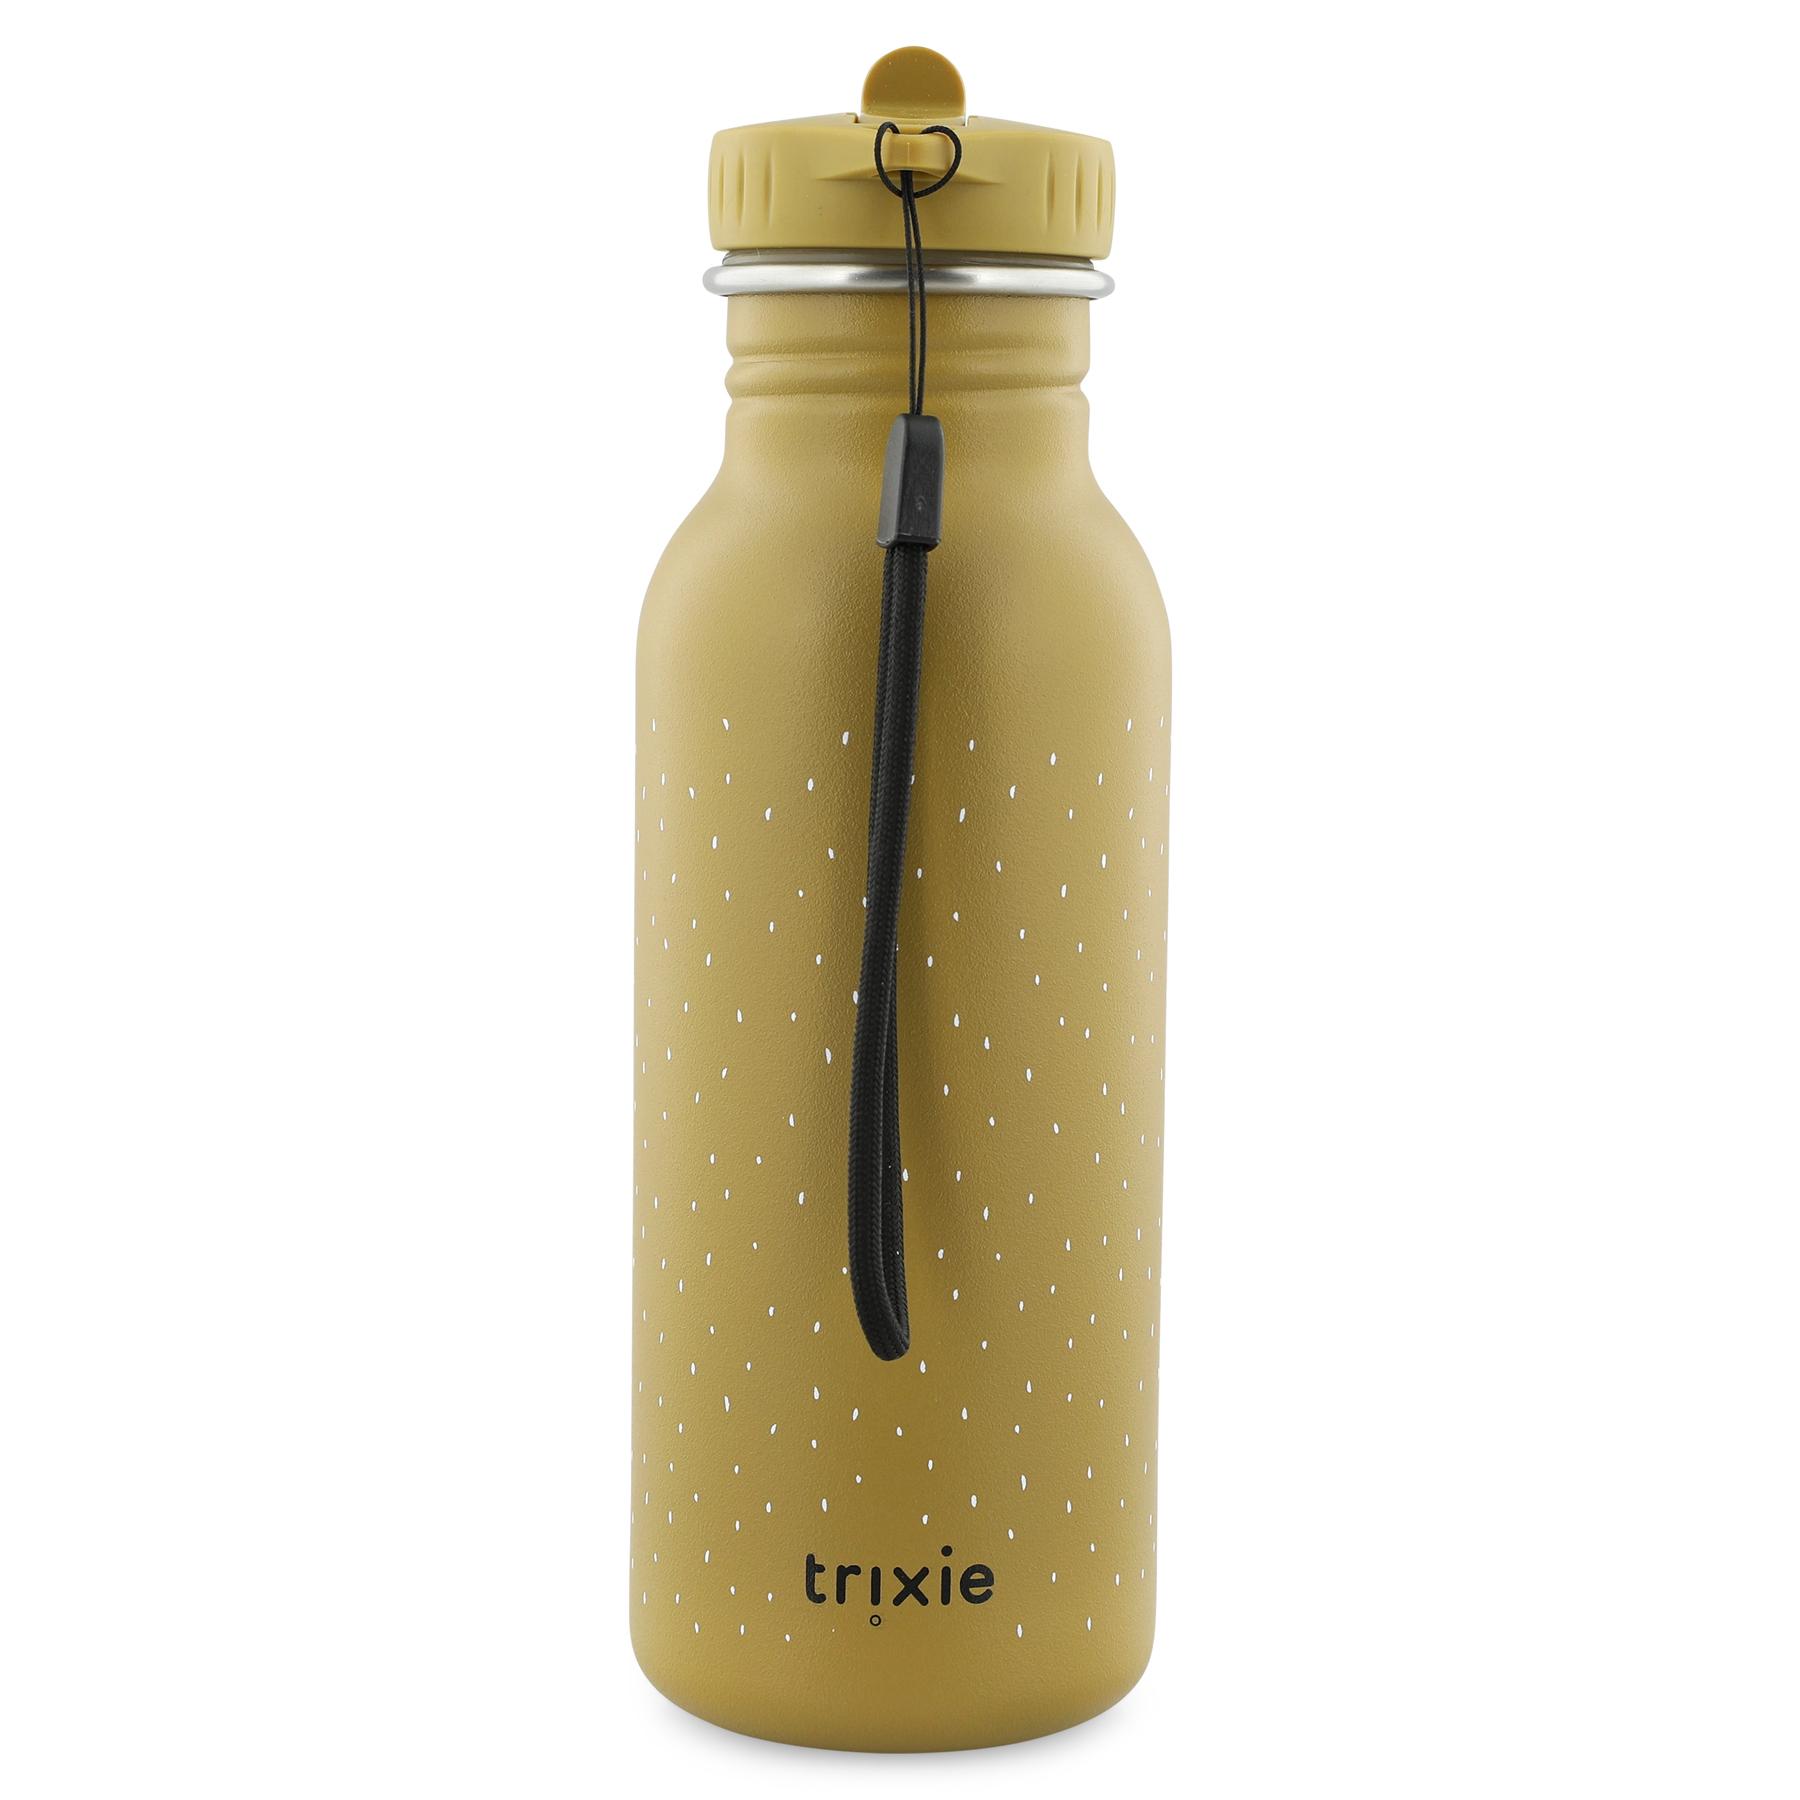 Afbeelding Trixie drinkfles 500ml I Mr Koala